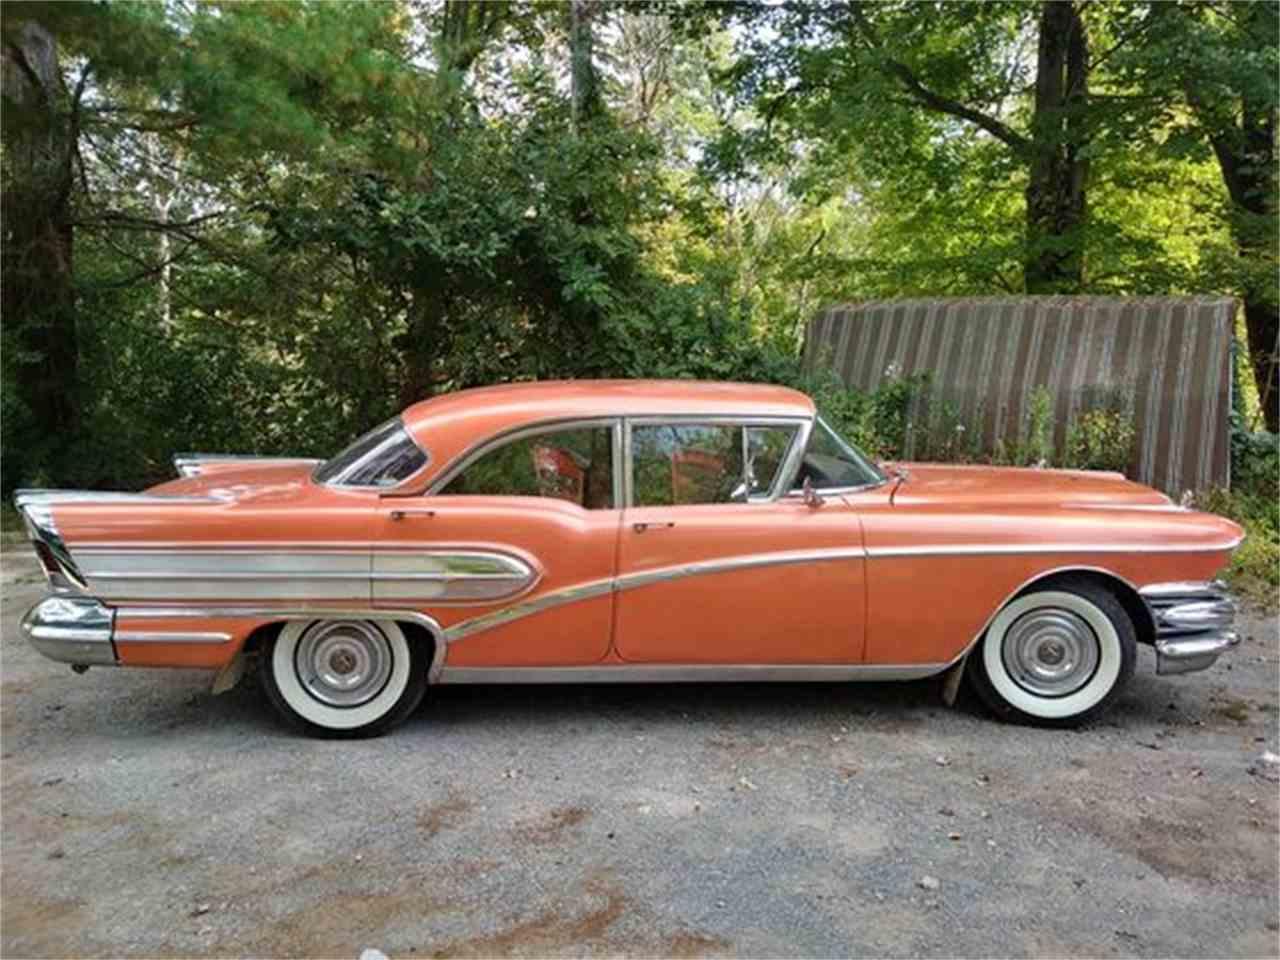 1958 Buick Special 4 Door Sedan For Sale Classiccars Com Cc 1032494